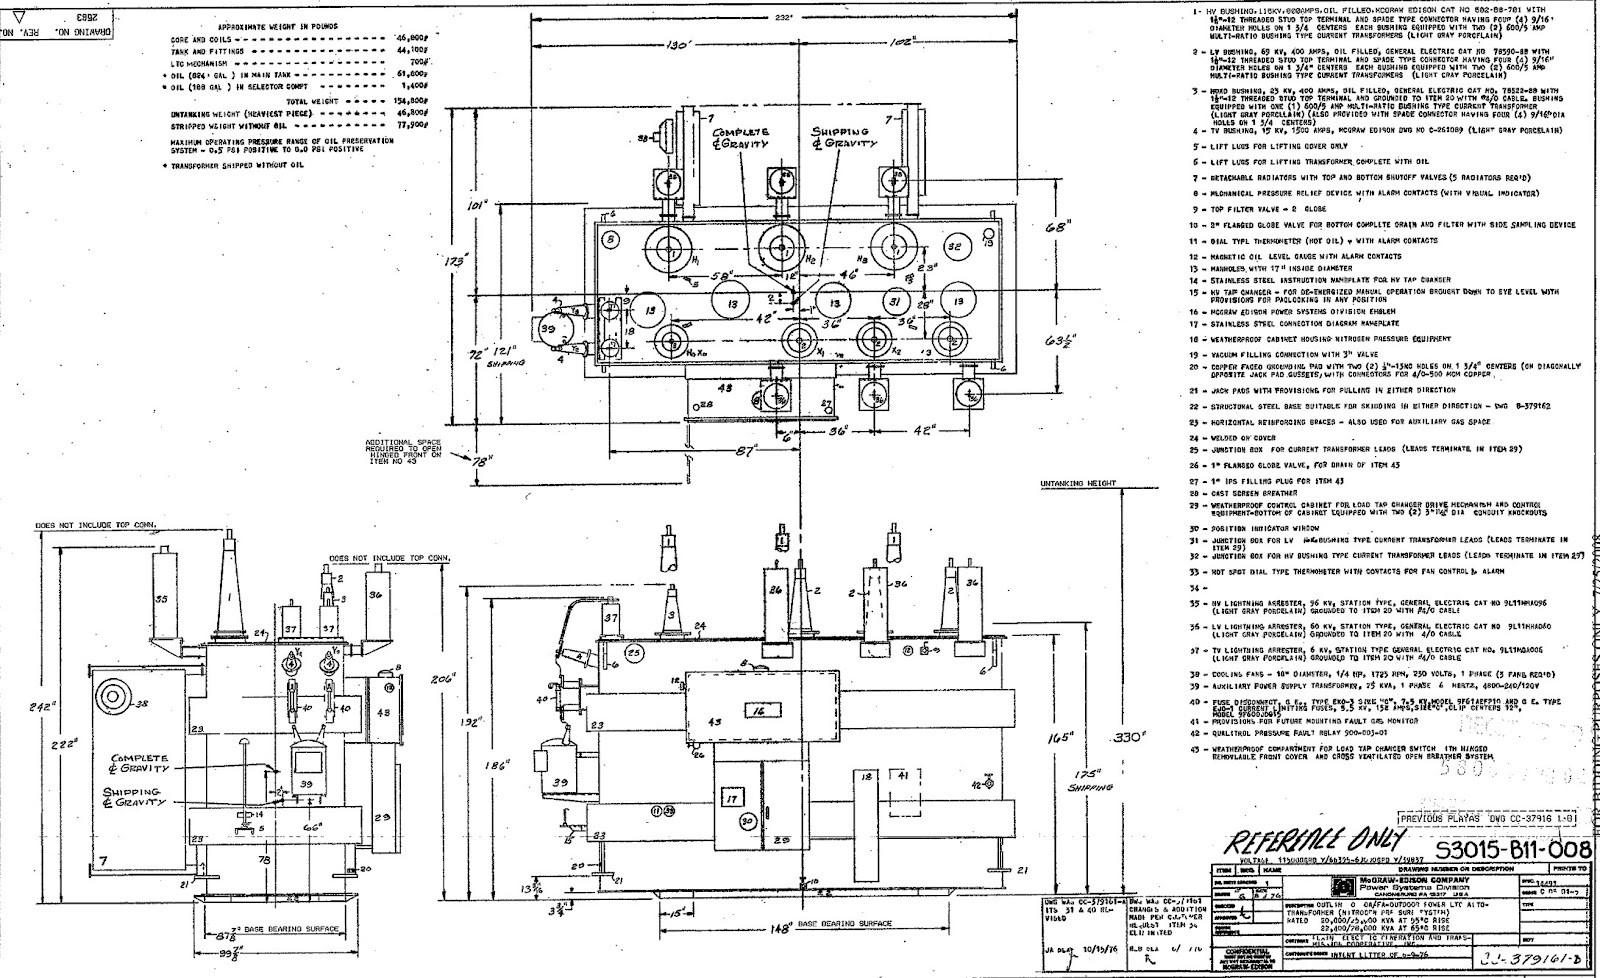 Pleasing Wiring Acme Diagram Industrial Control Transformer Wiring Diagram Wiring Cloud Ittabisraaidewilluminateatxorg